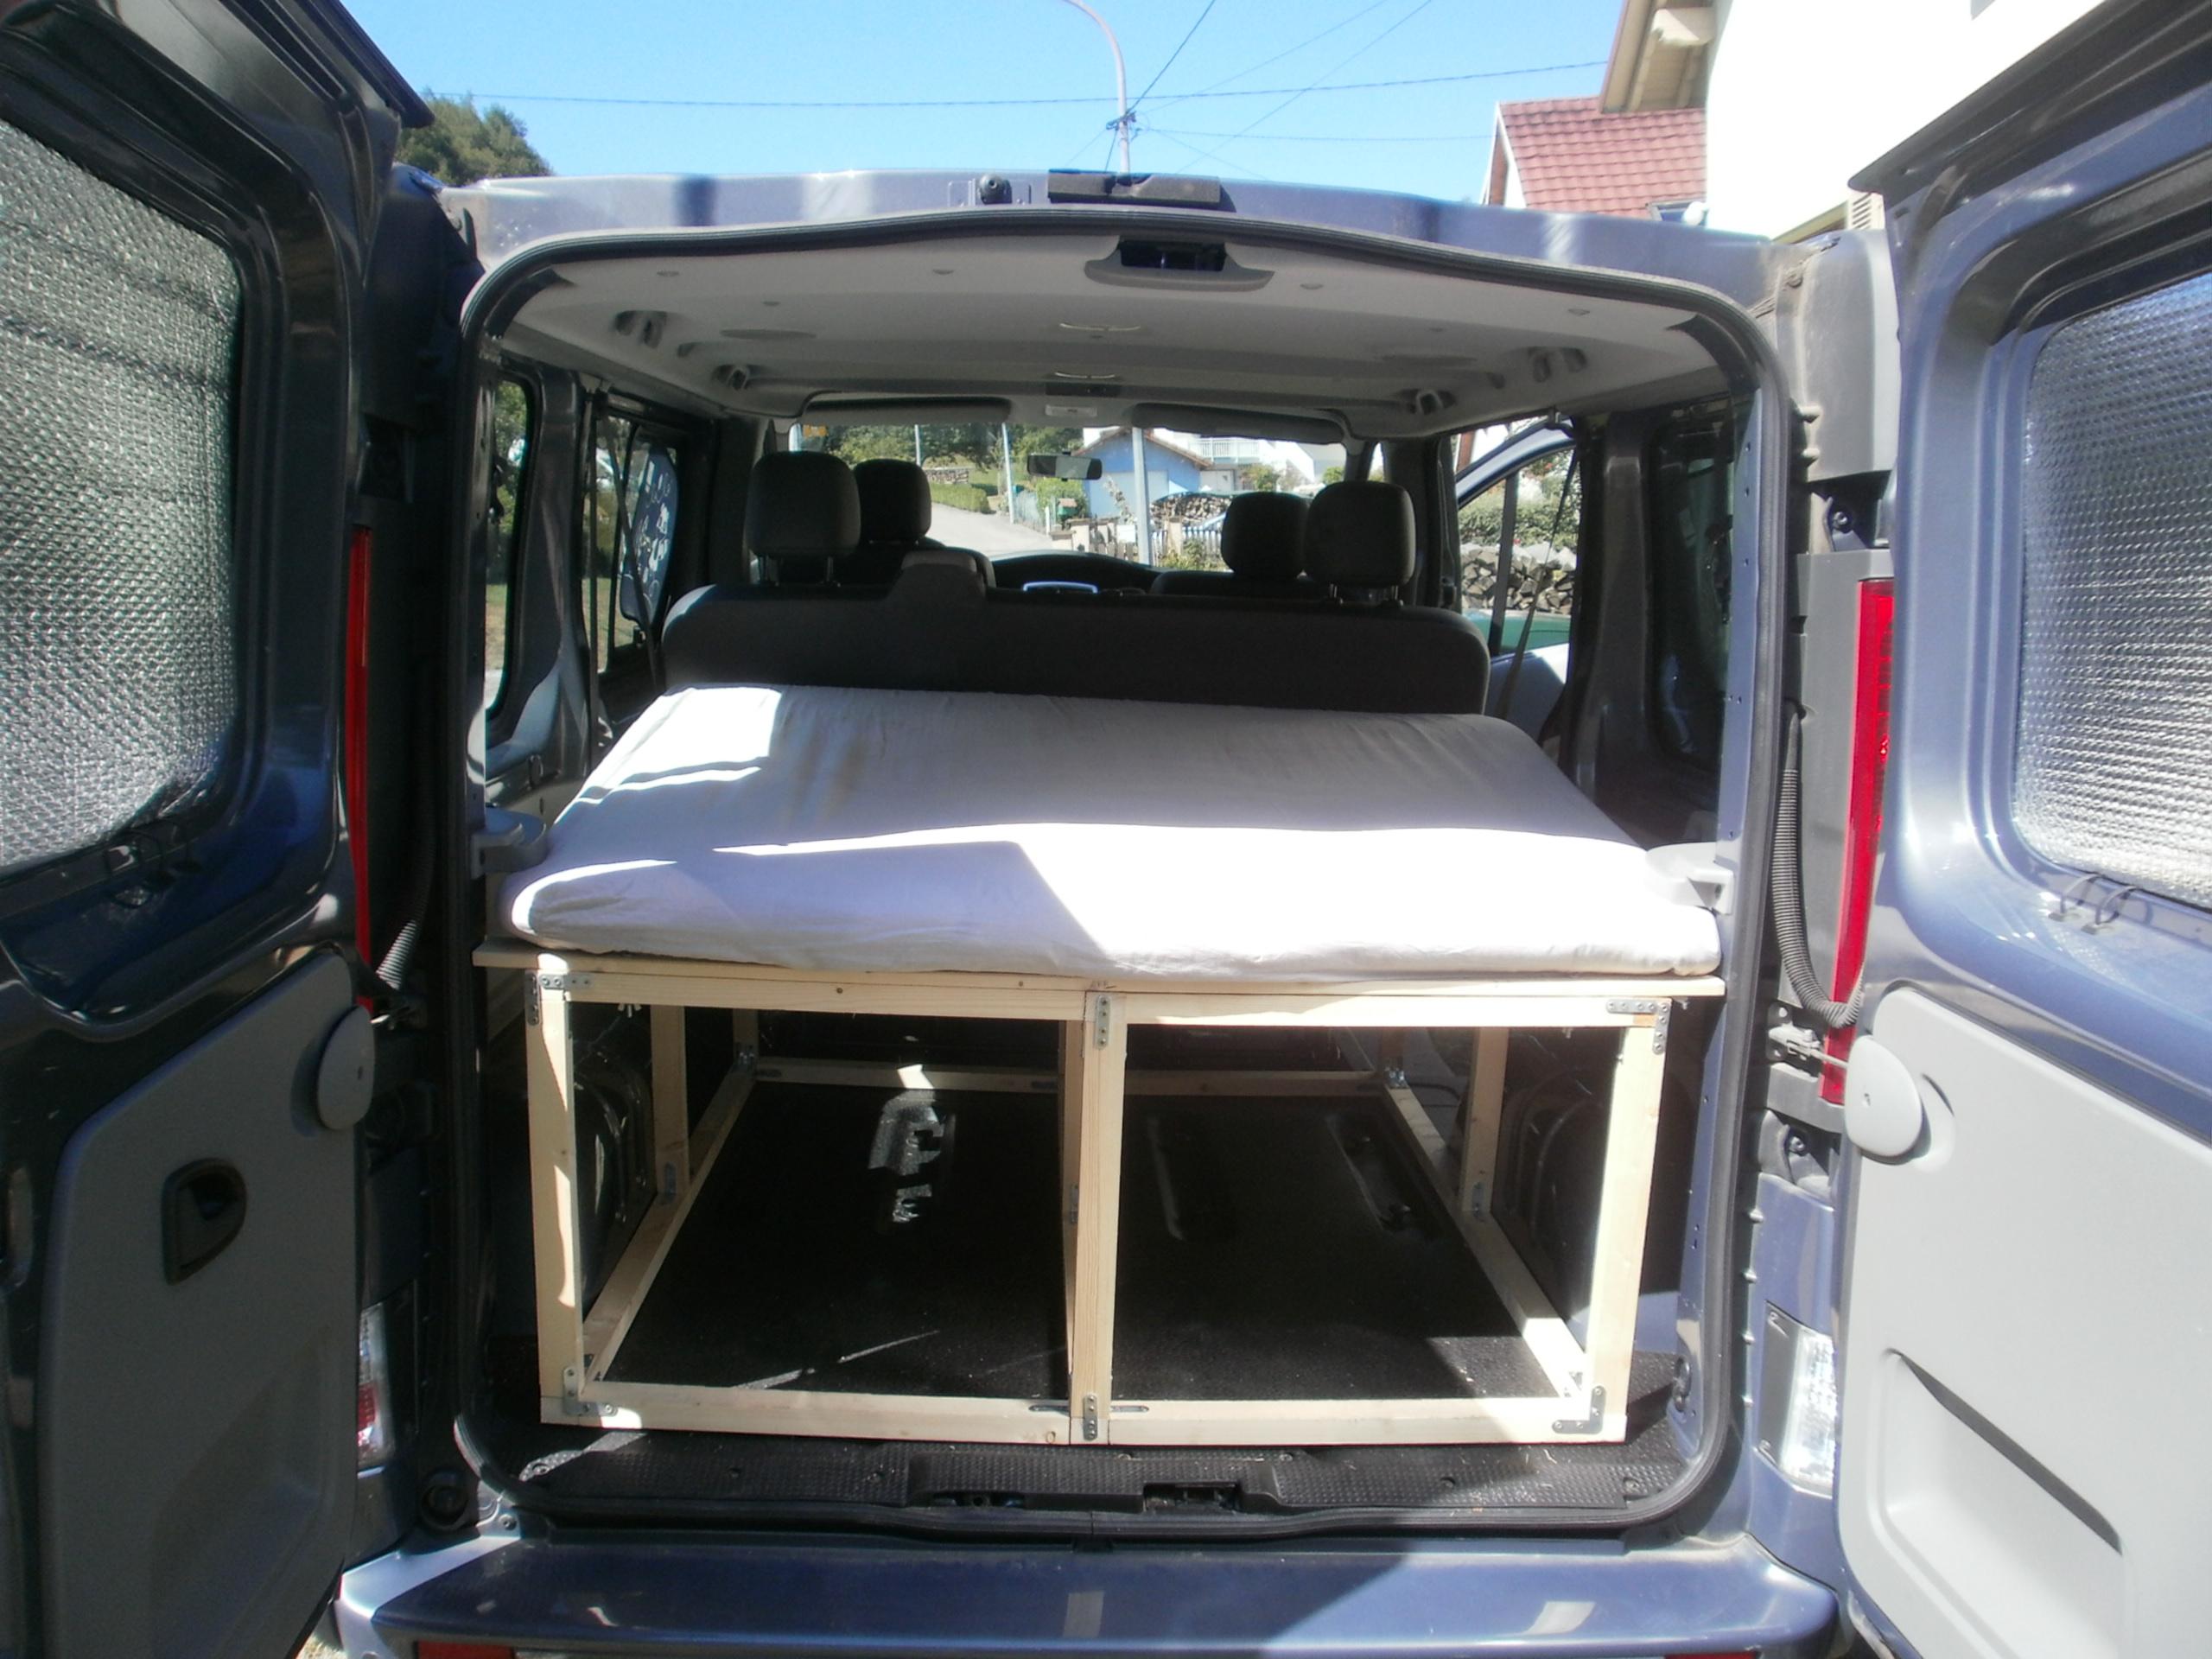 amenagement fourgon trafic l1h1 om89 montrealeast. Black Bedroom Furniture Sets. Home Design Ideas